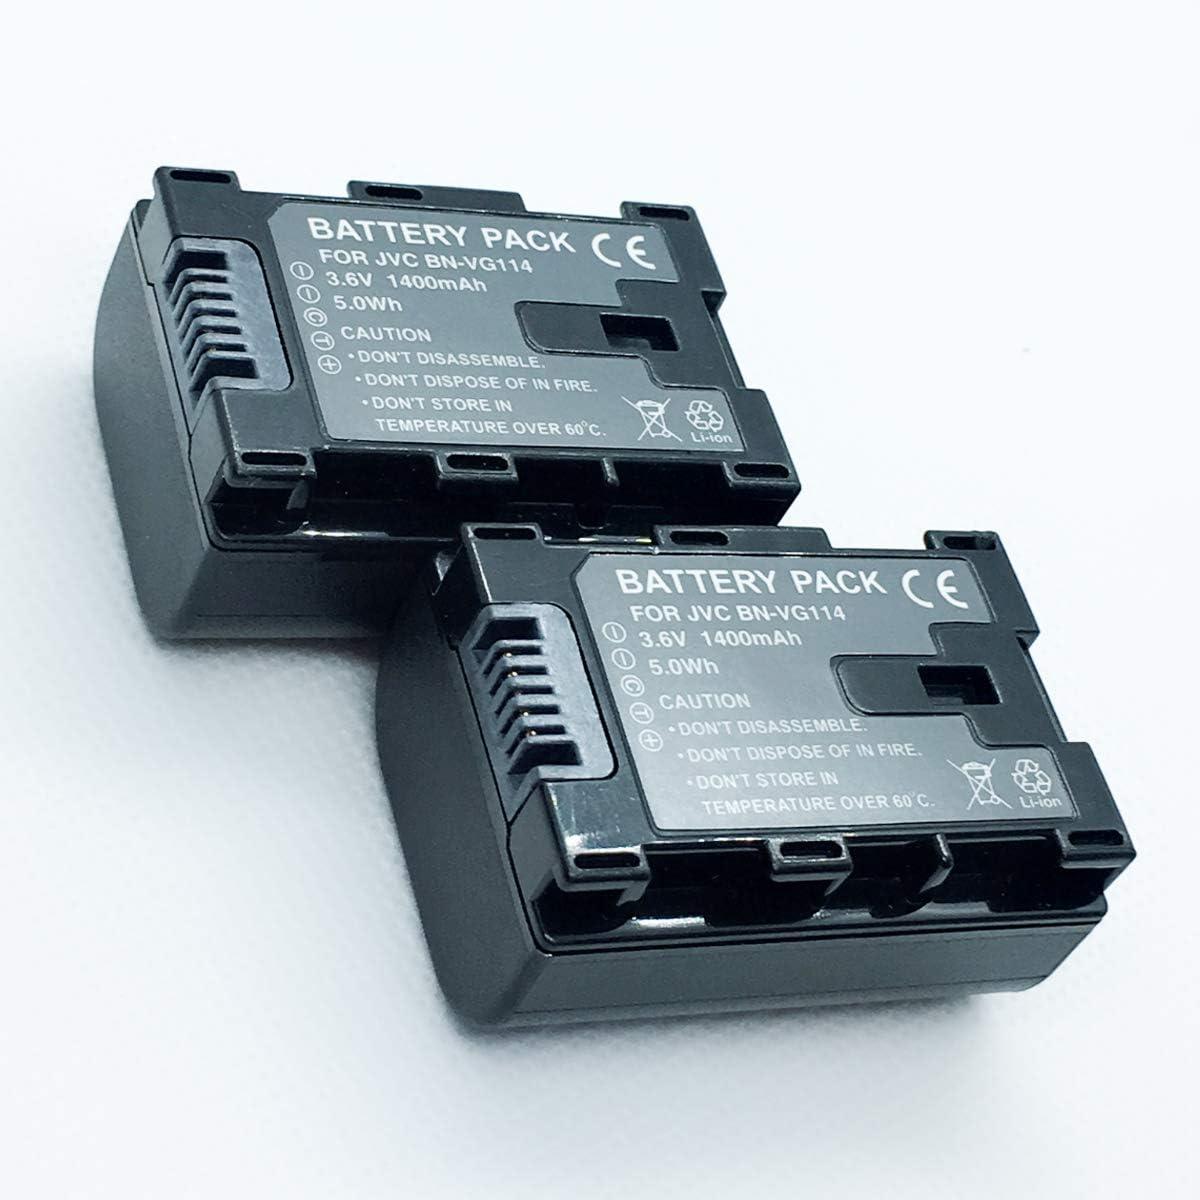 Bateria para JVC BN-VG108 BN-VG107 BN-VG114 BN-VG138 BN-VG121 890mAh